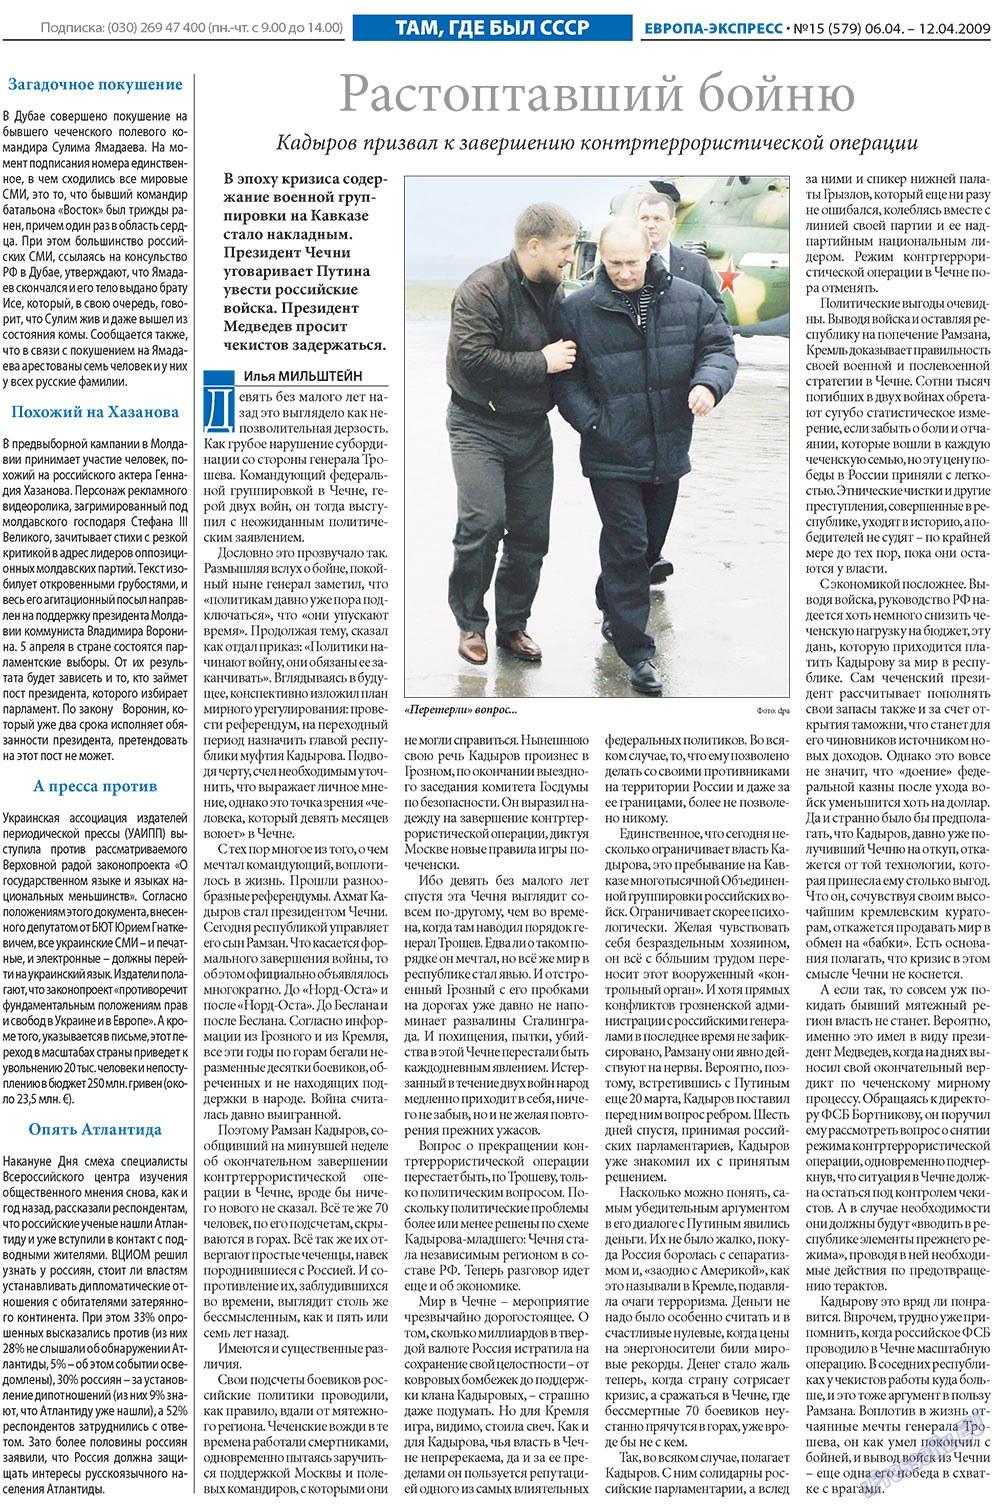 Европа экспресс (газета). 2009 год, номер 15, стр. 12